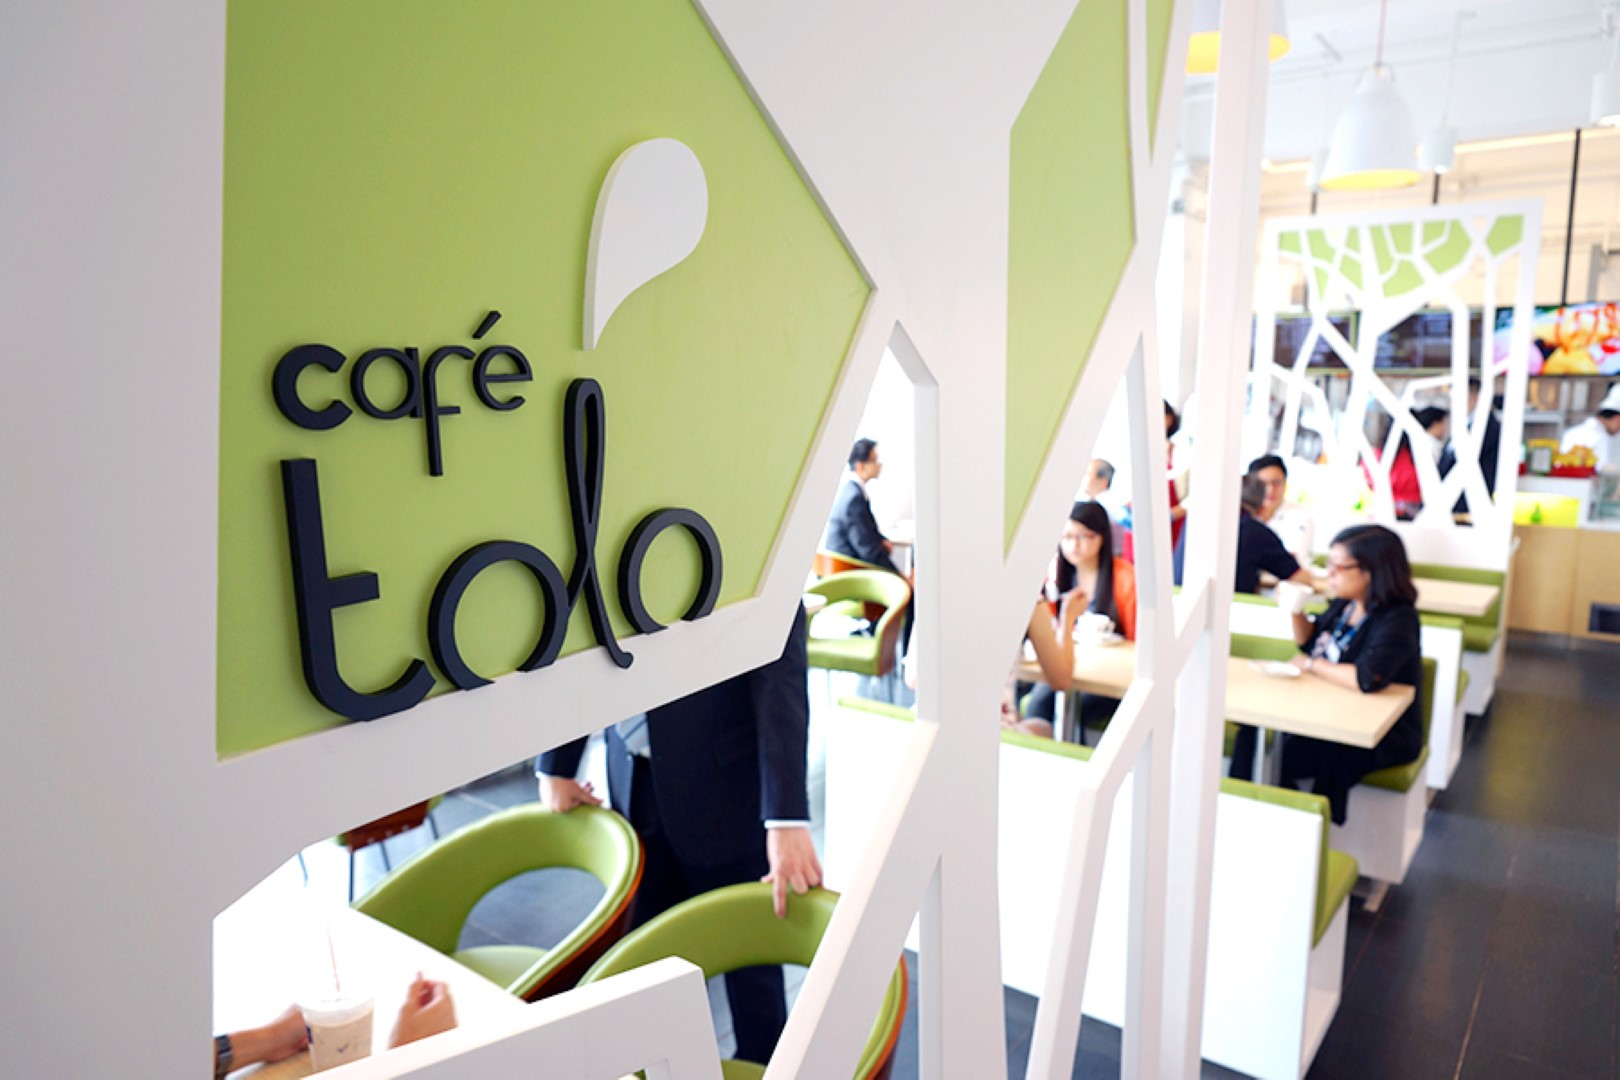 Cafe Tolo